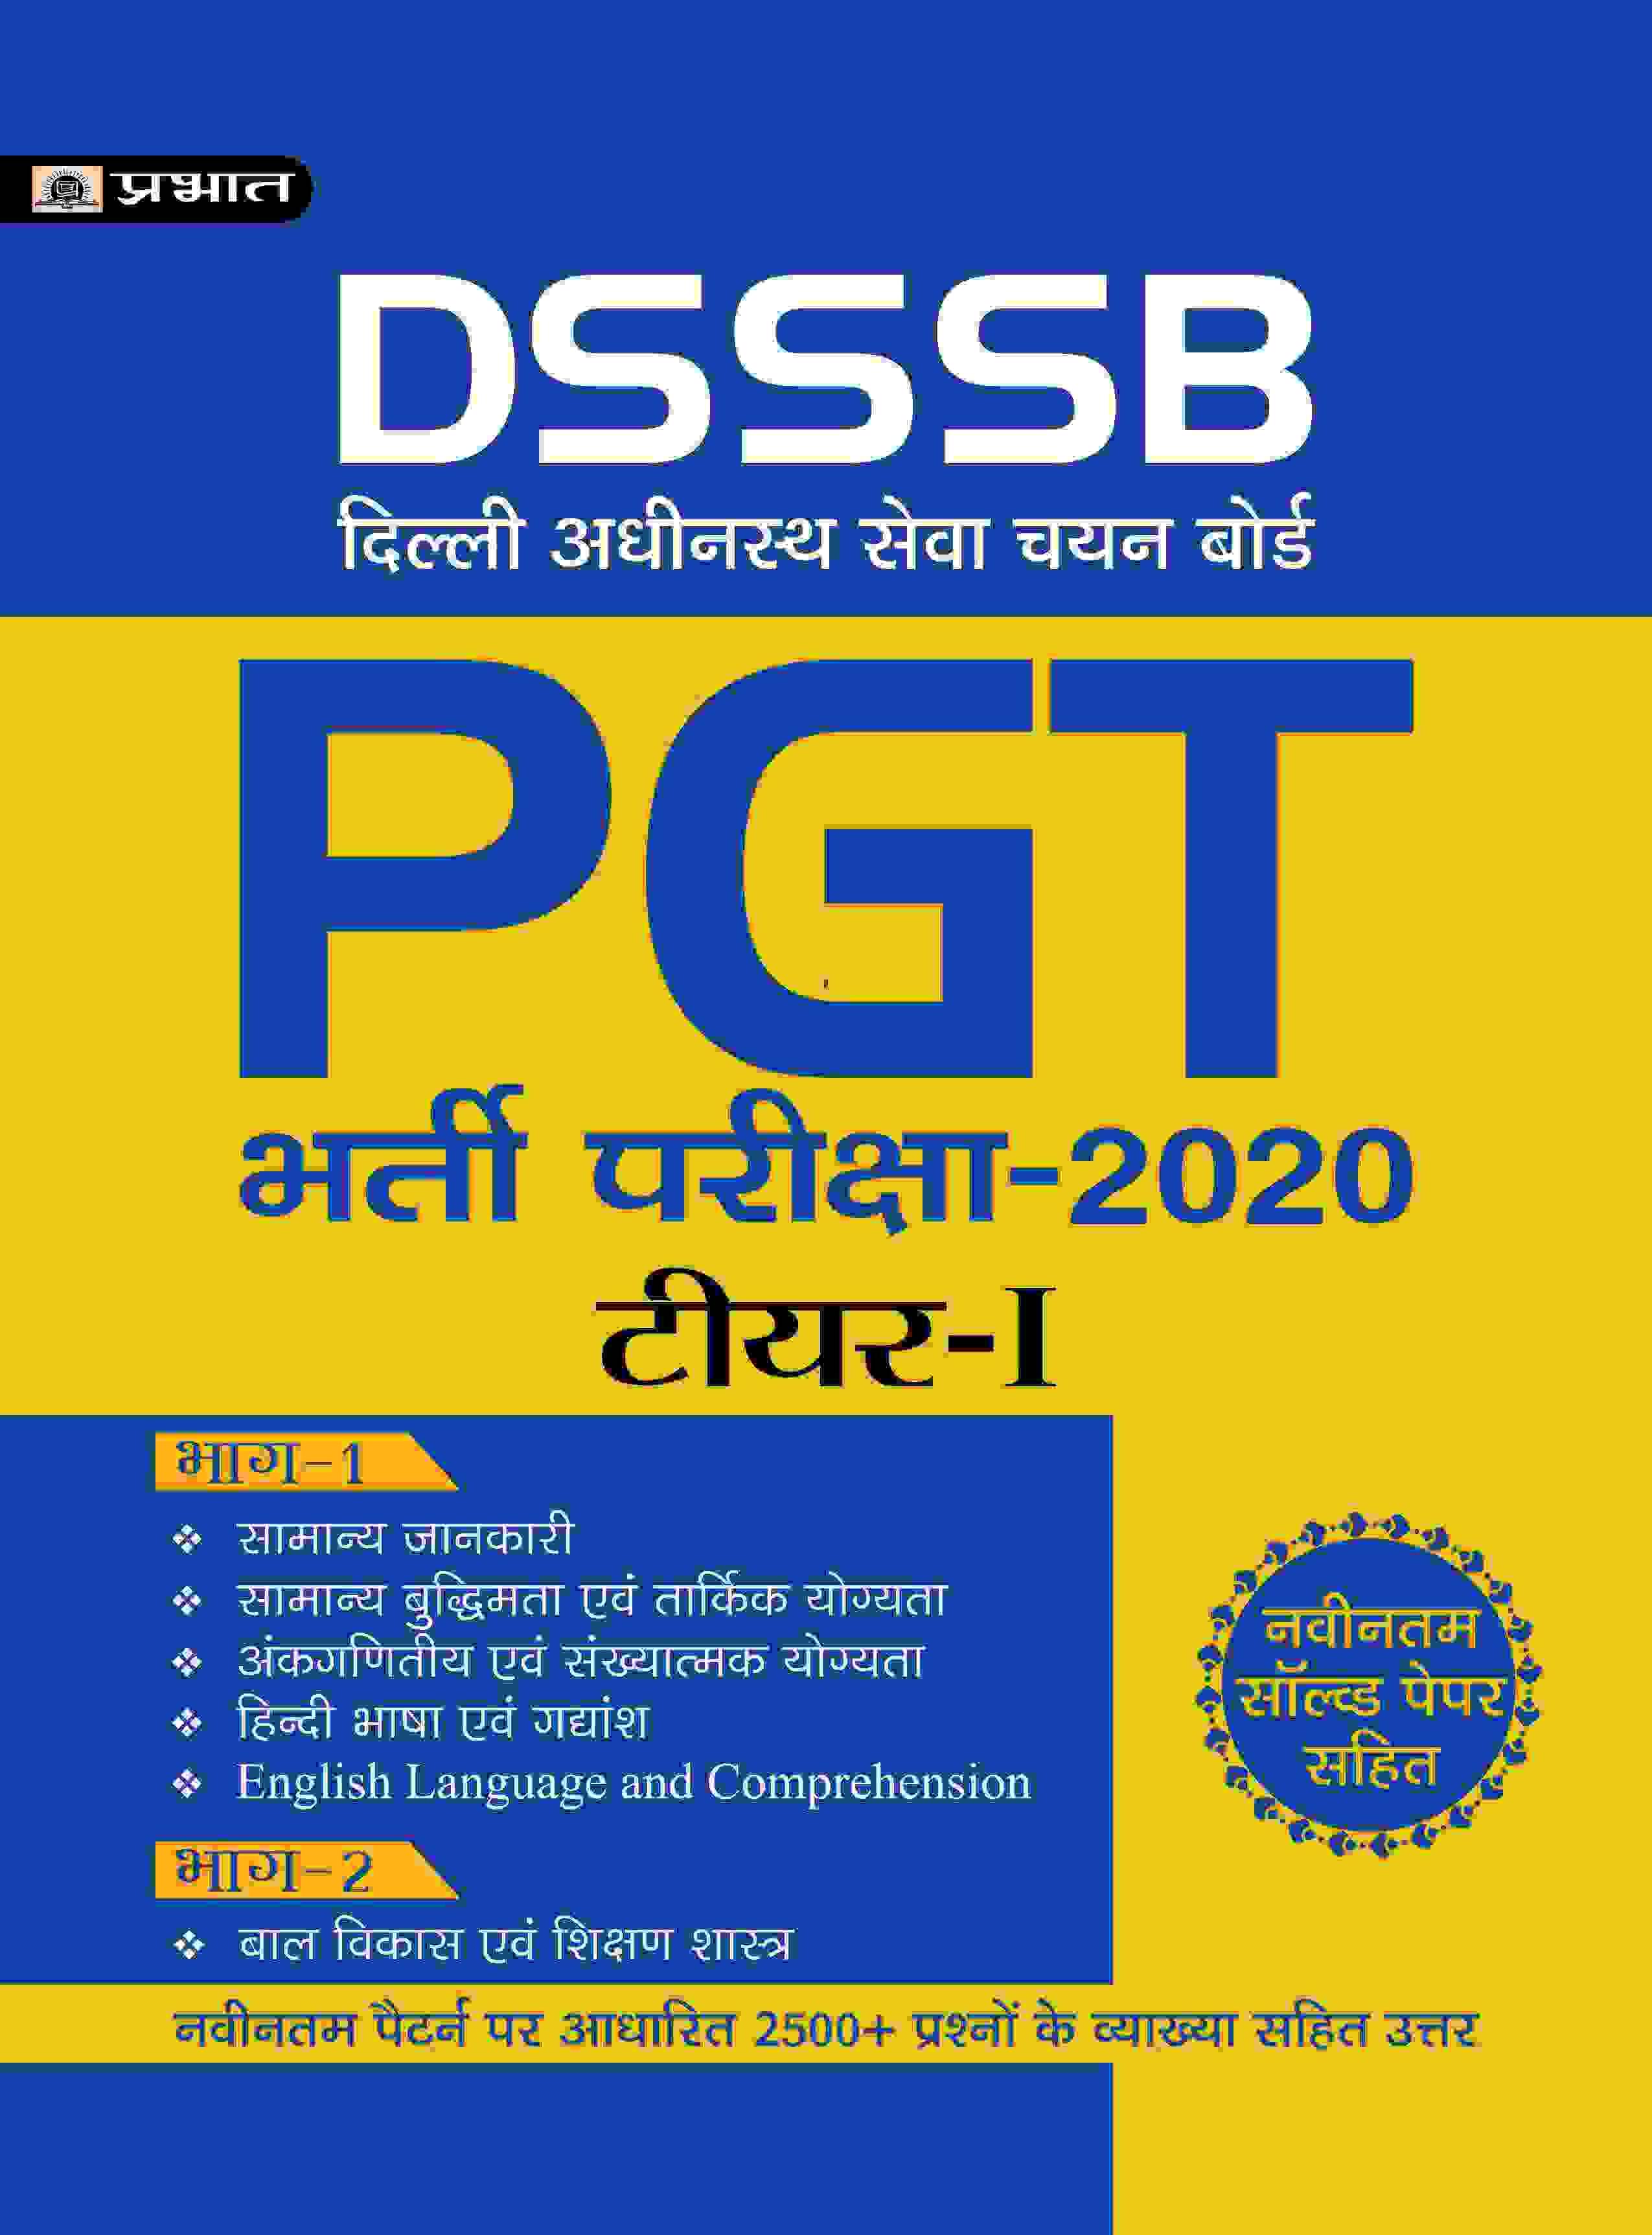 DSSB PGT GUIDE